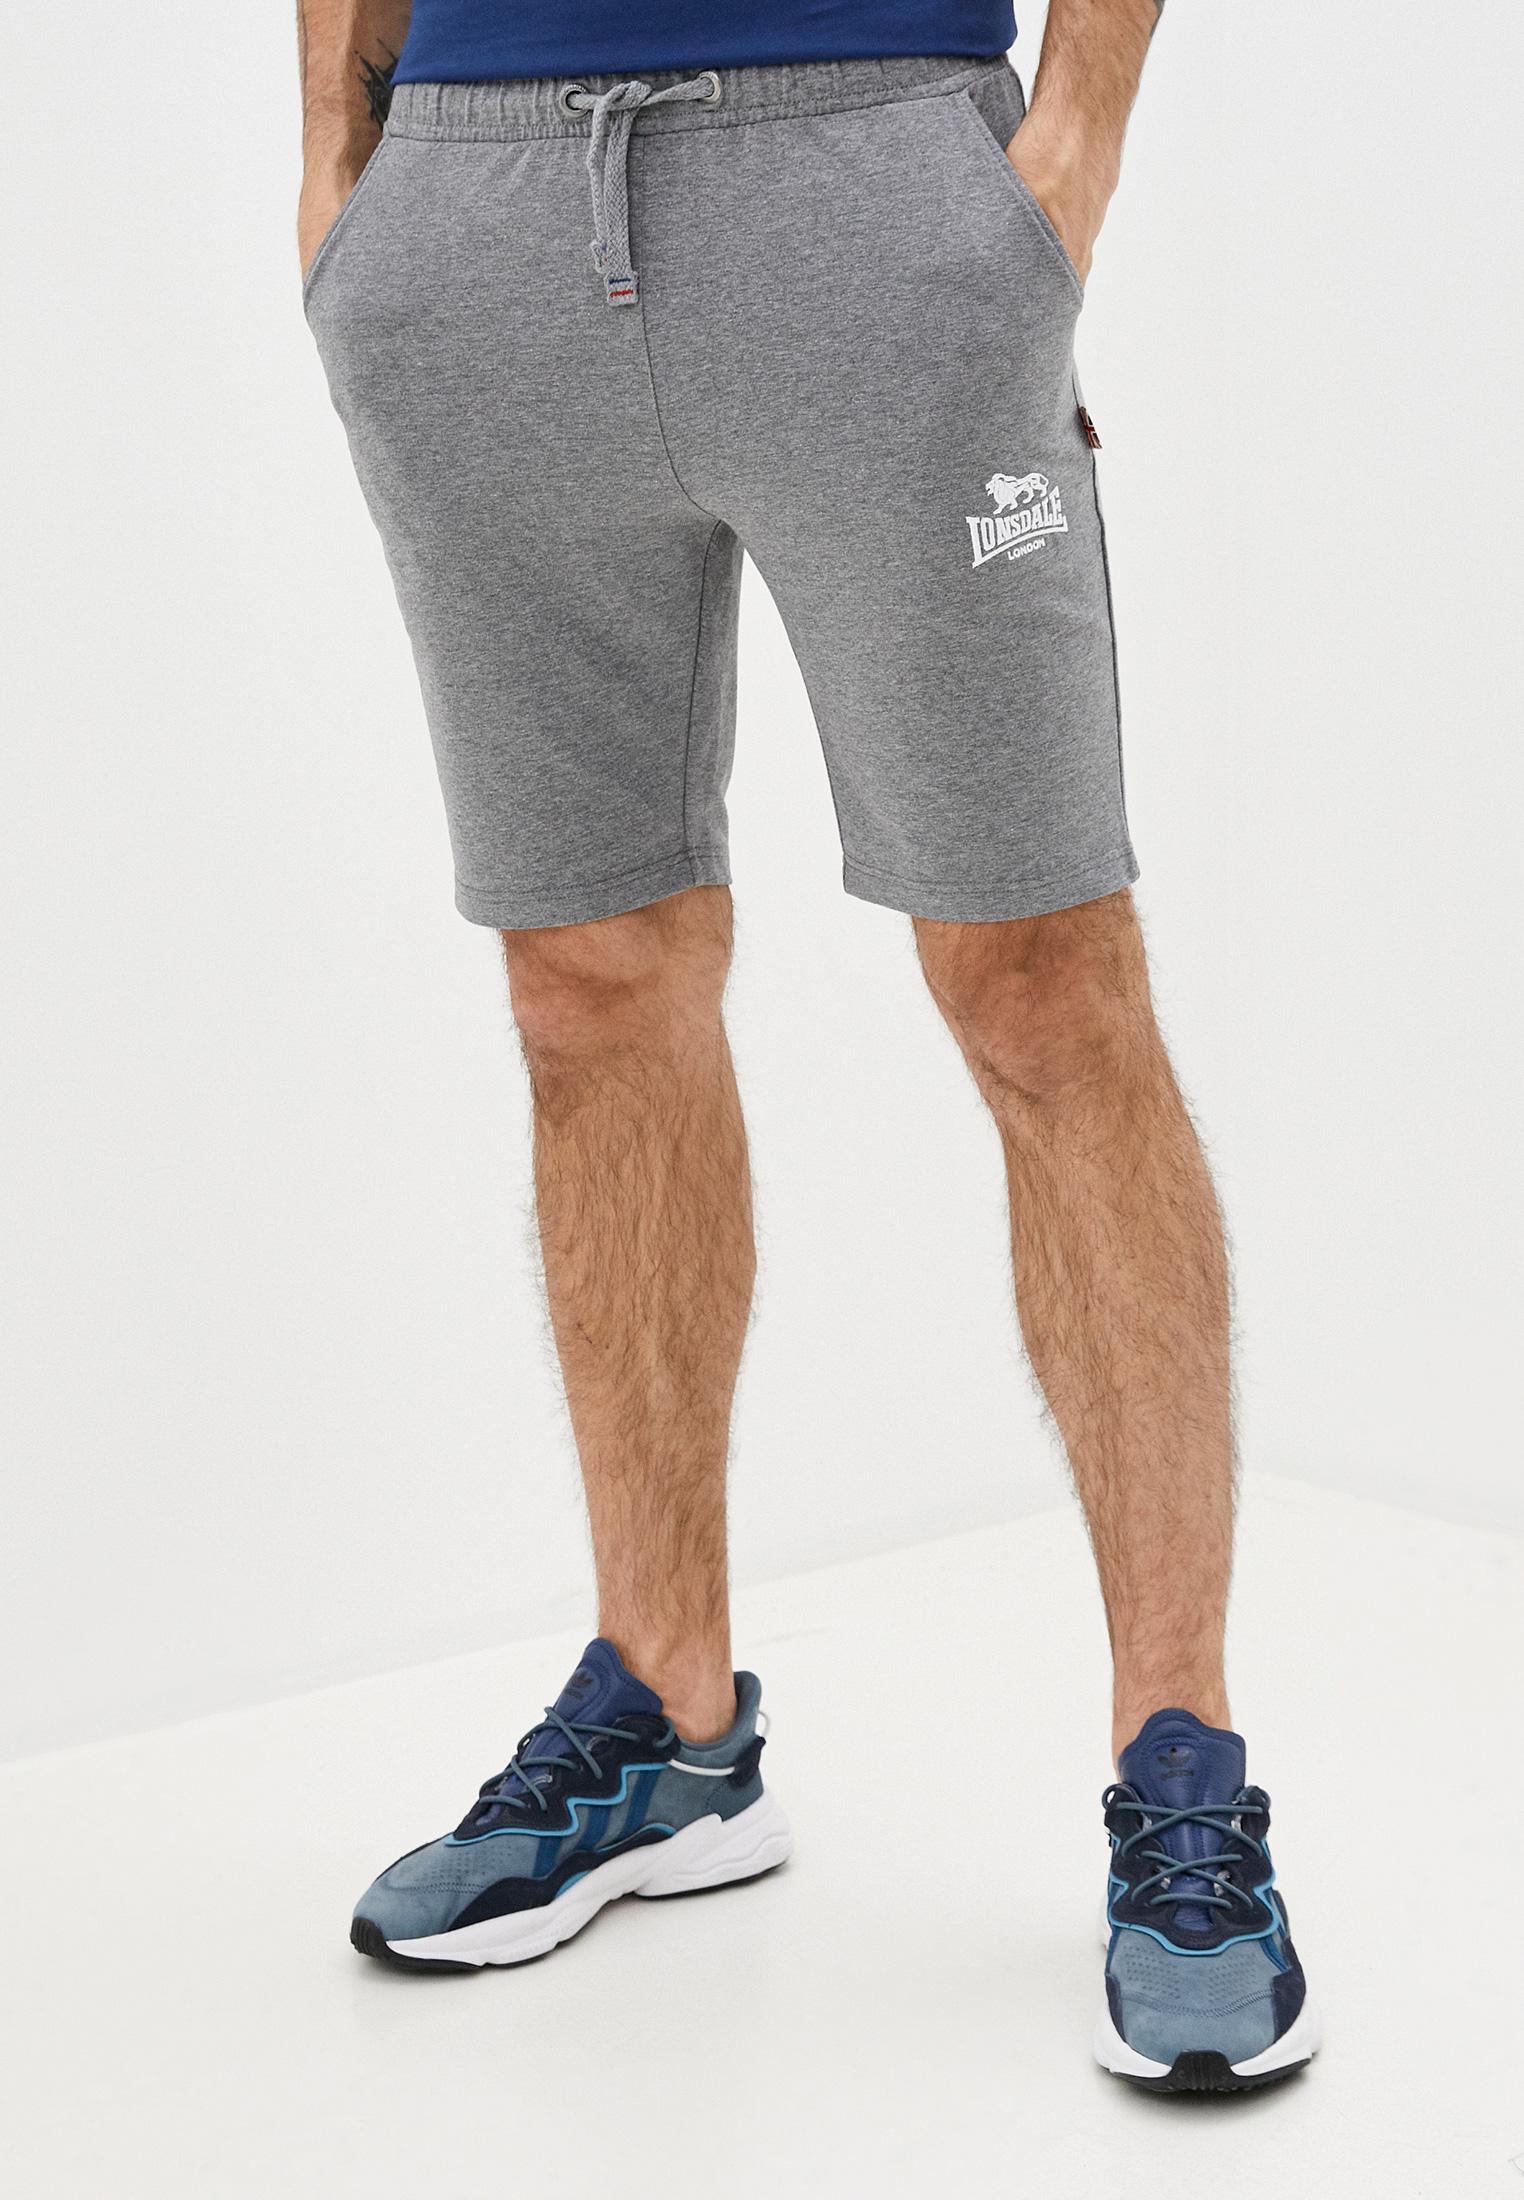 Мужские шорты Lonsdale (Лонсдейл) MSH017